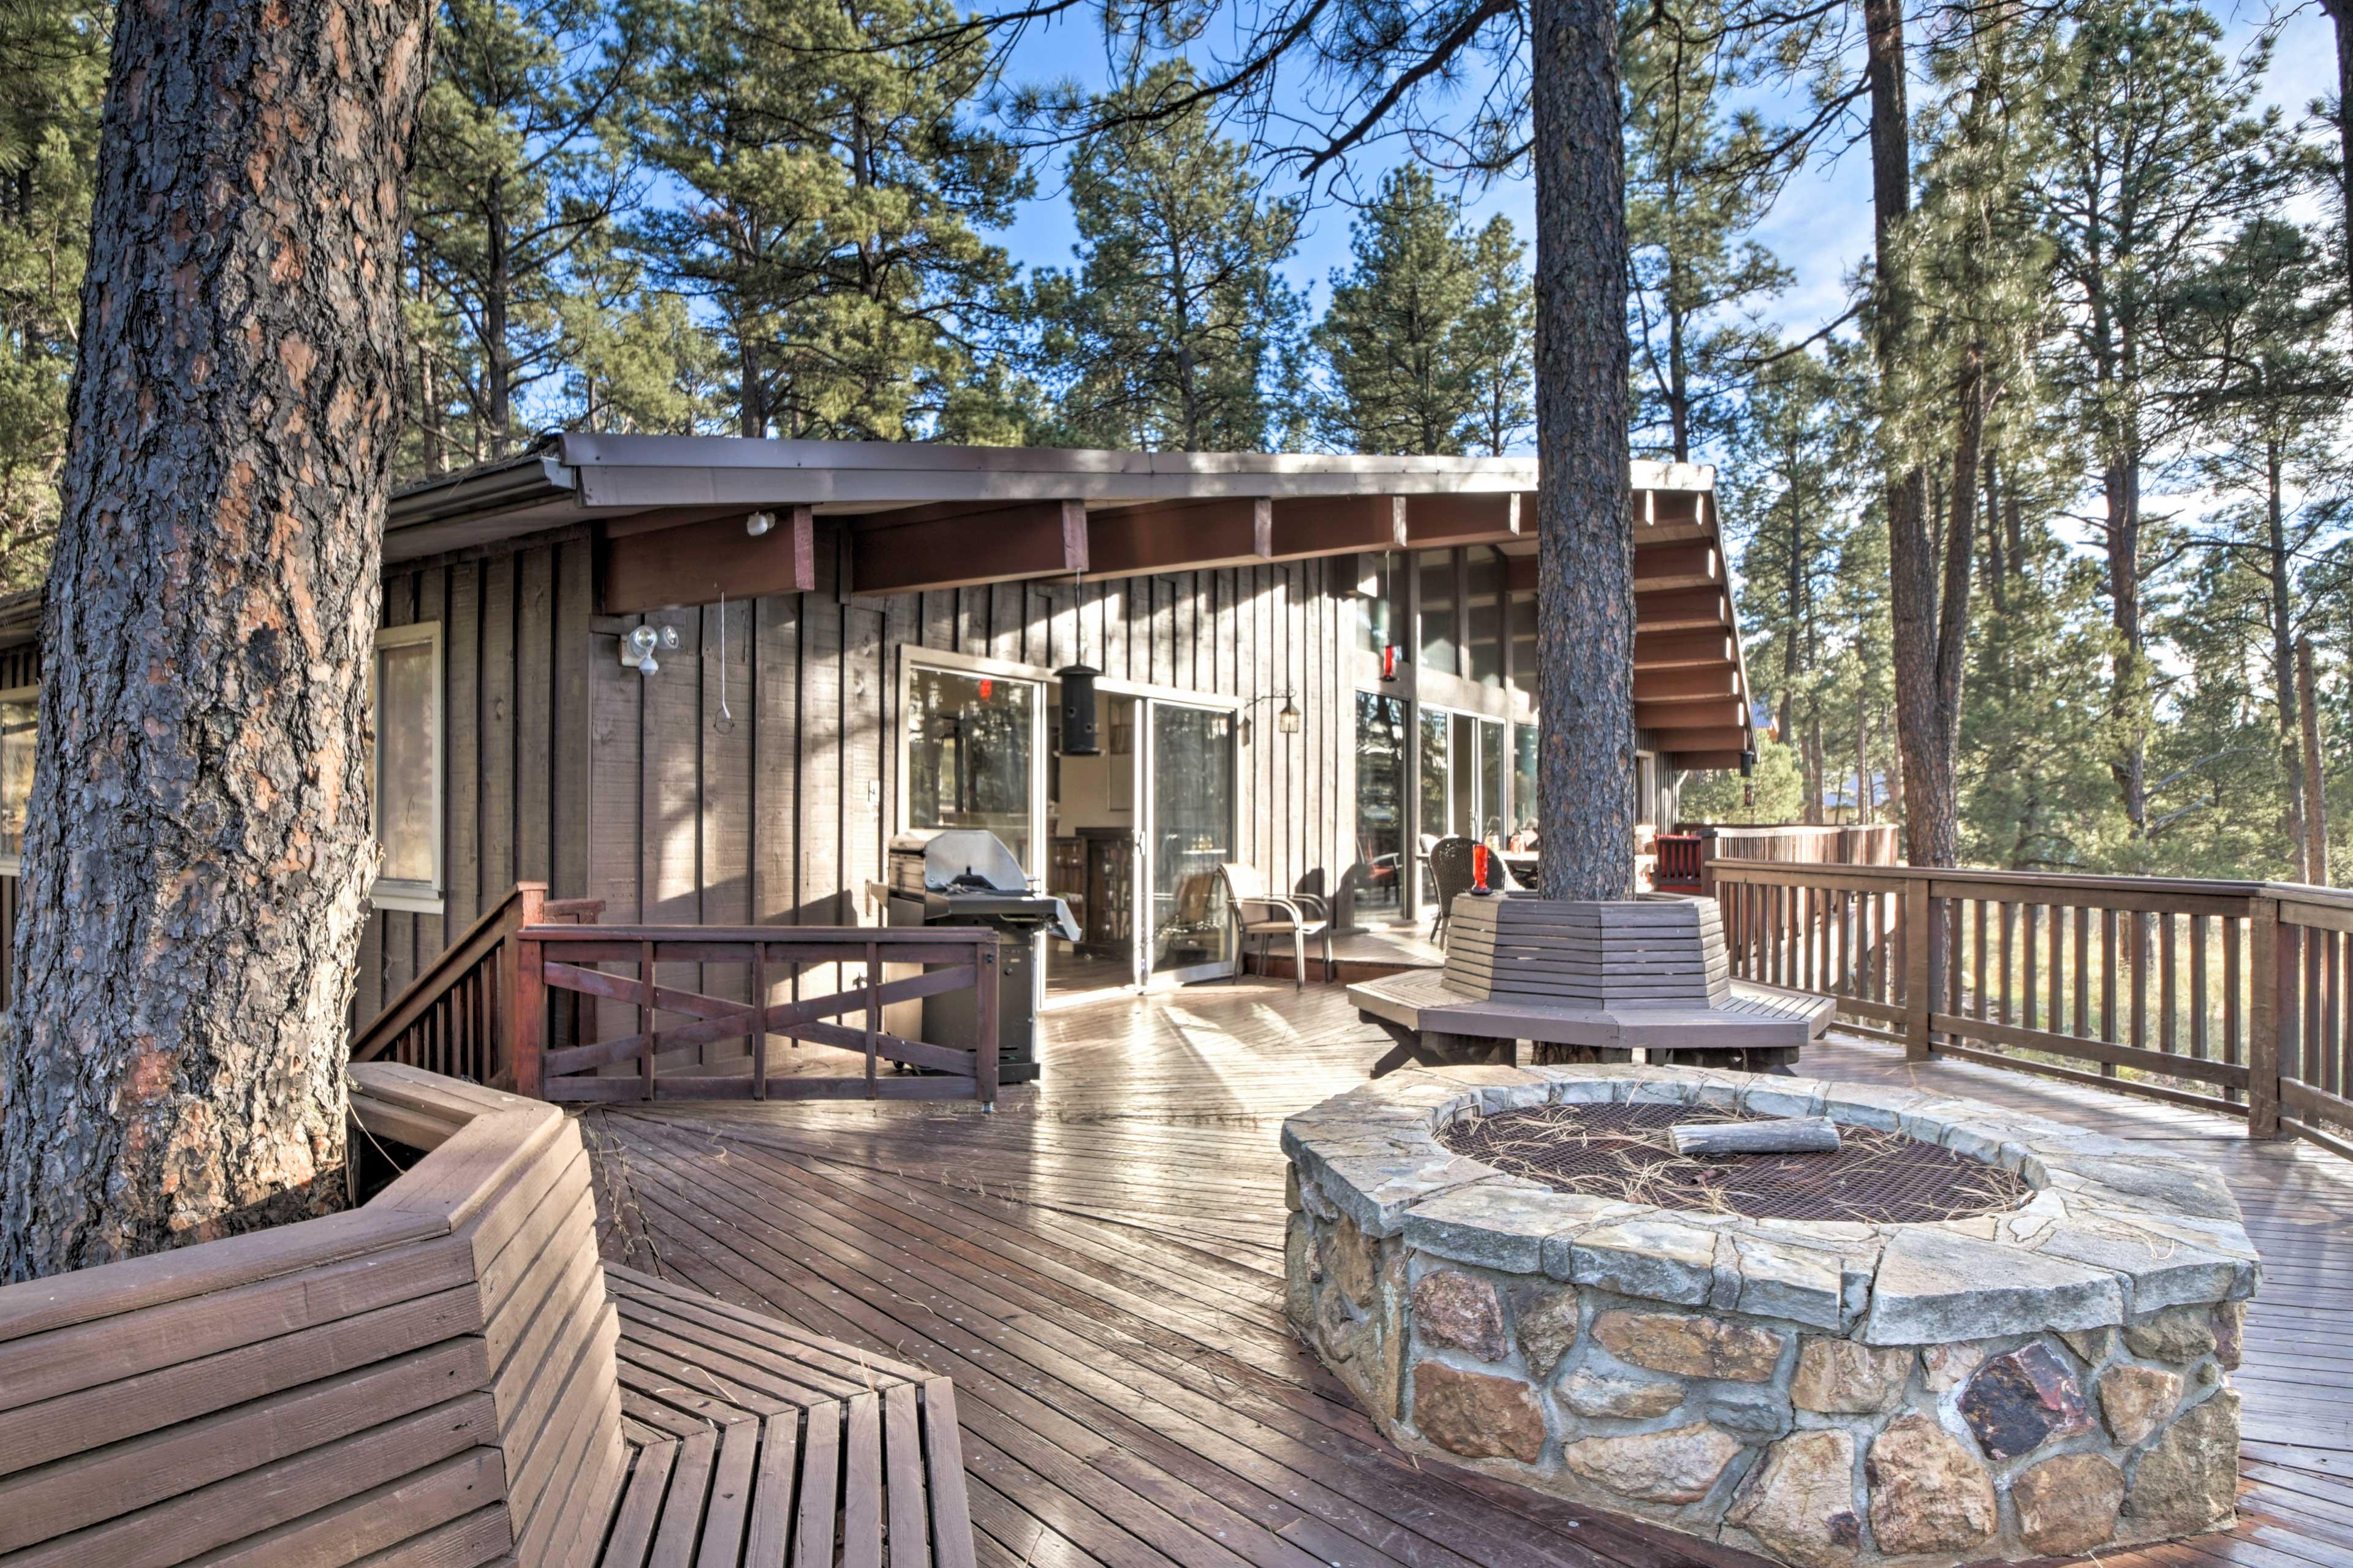 The sprawling vacation rental home boasts wraparound decks and epic views.